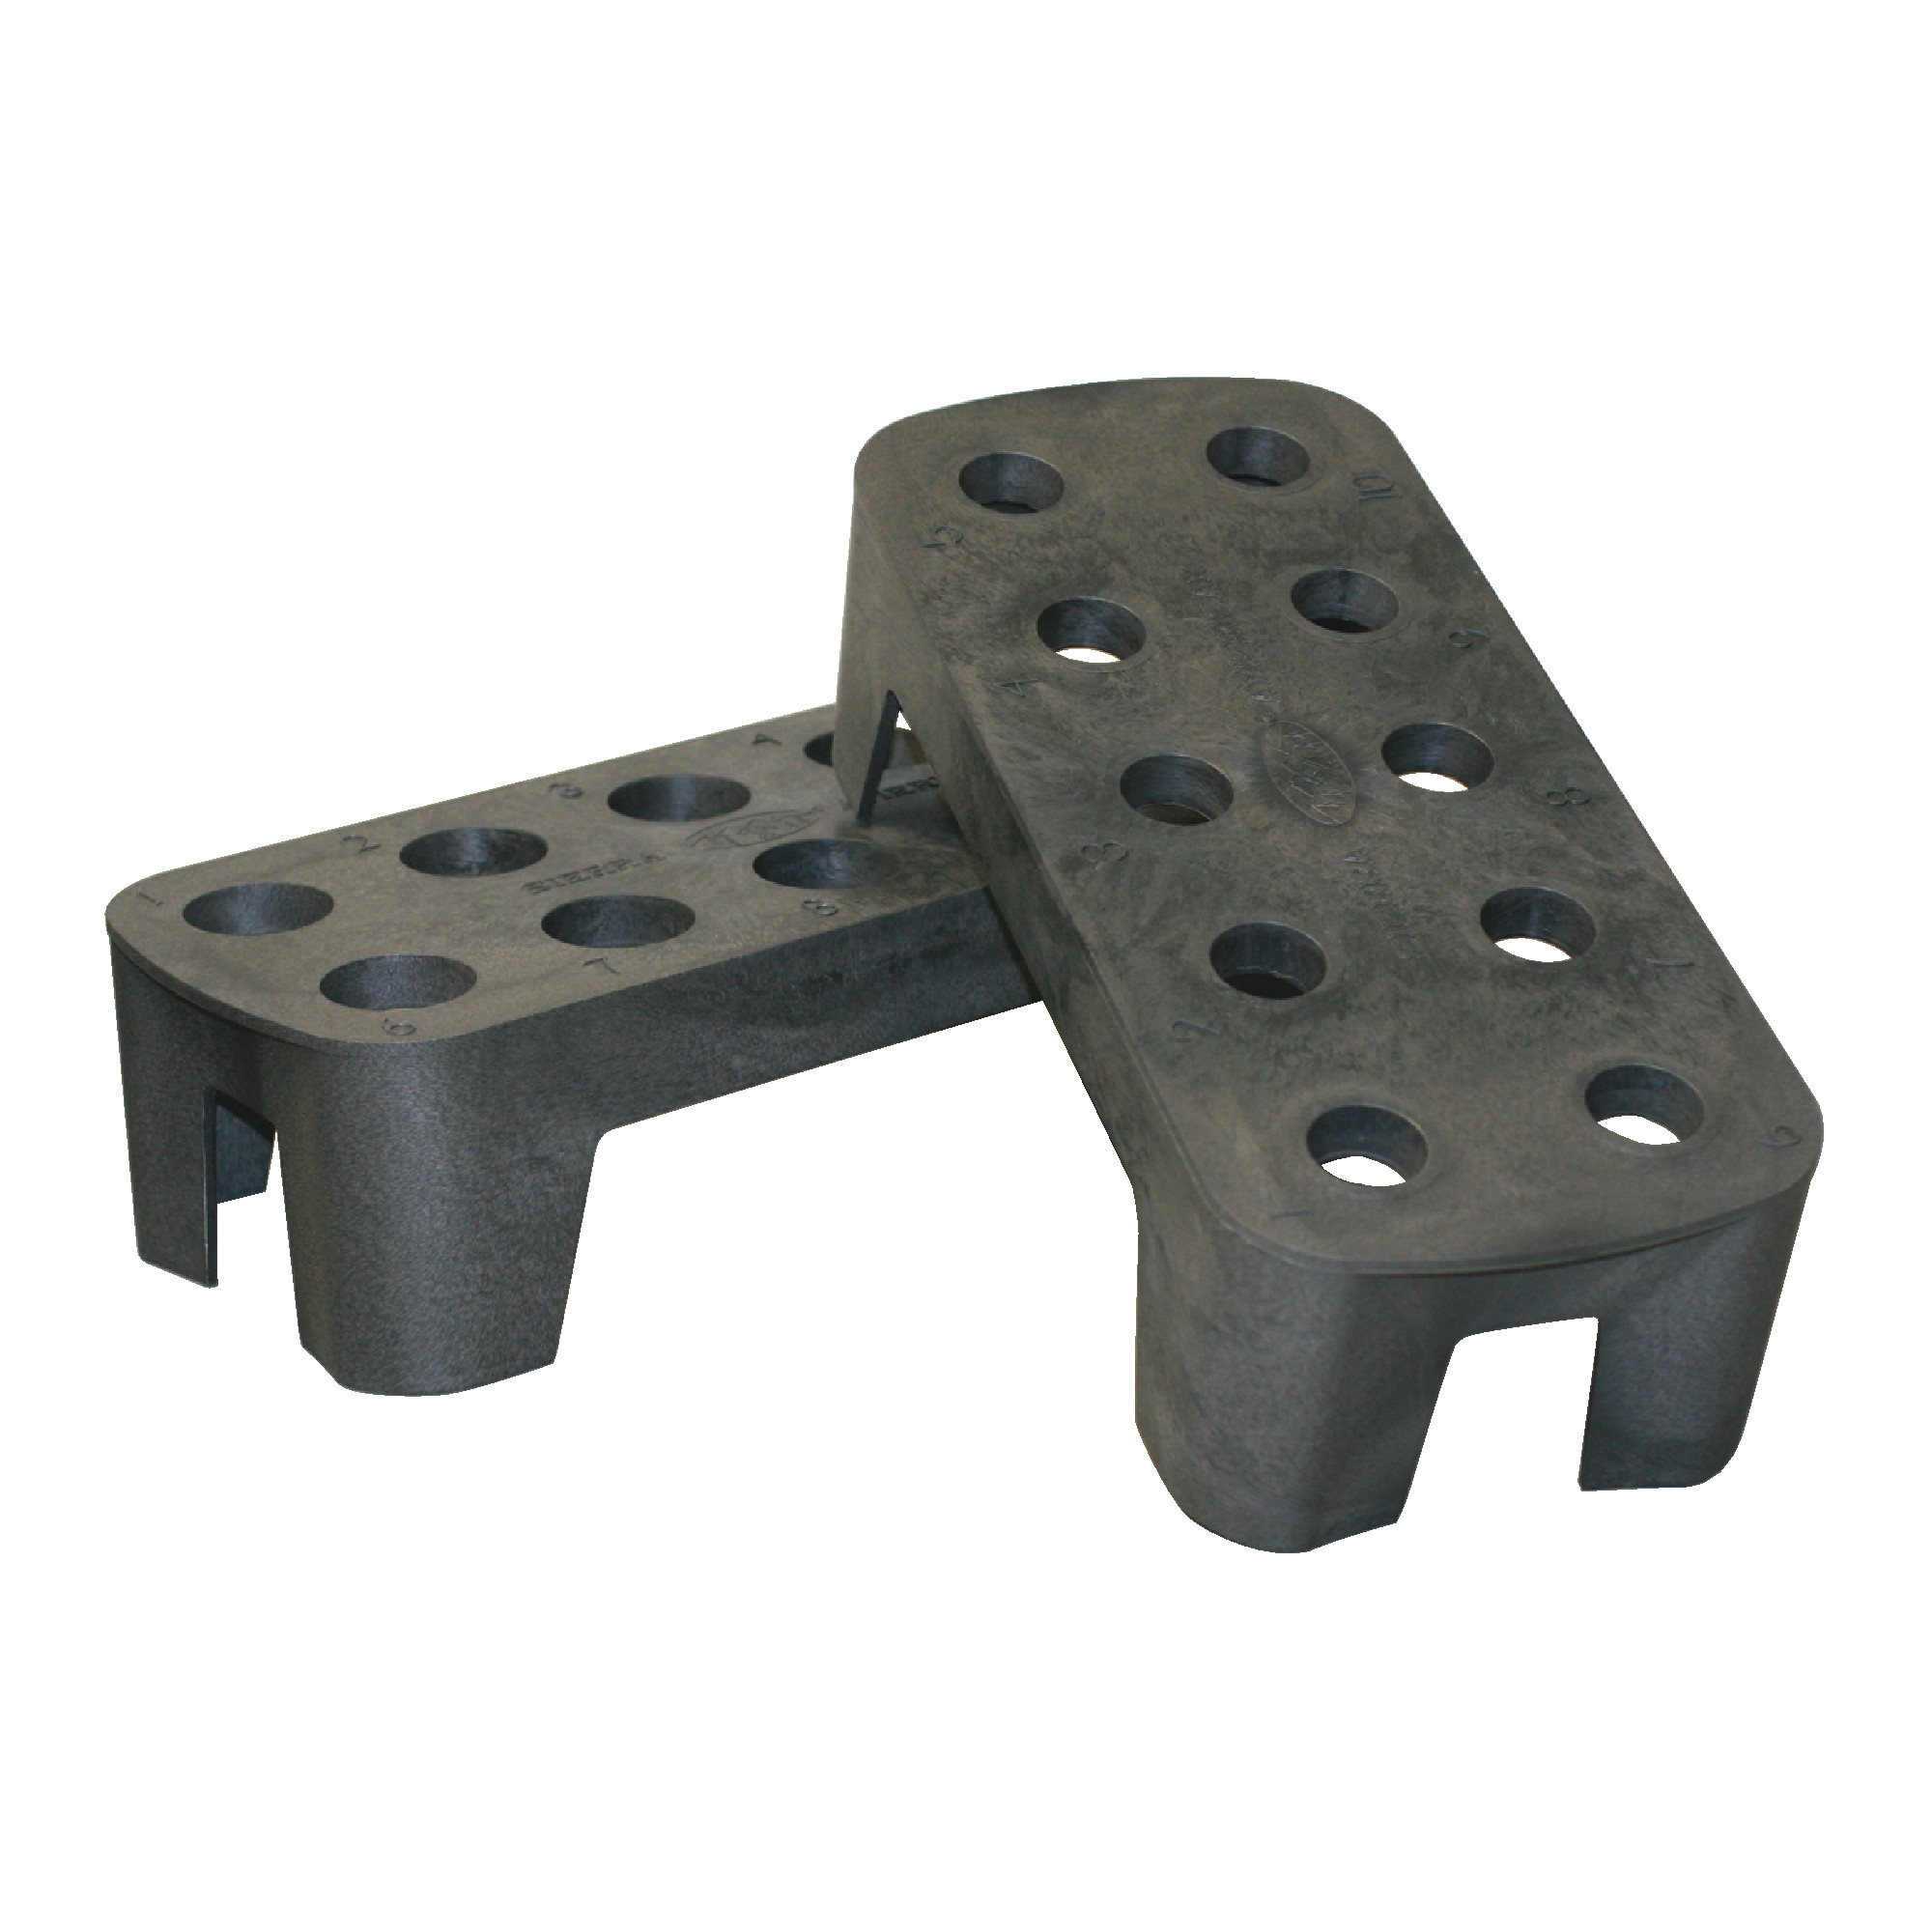 30 Taper CNC Tool Tray